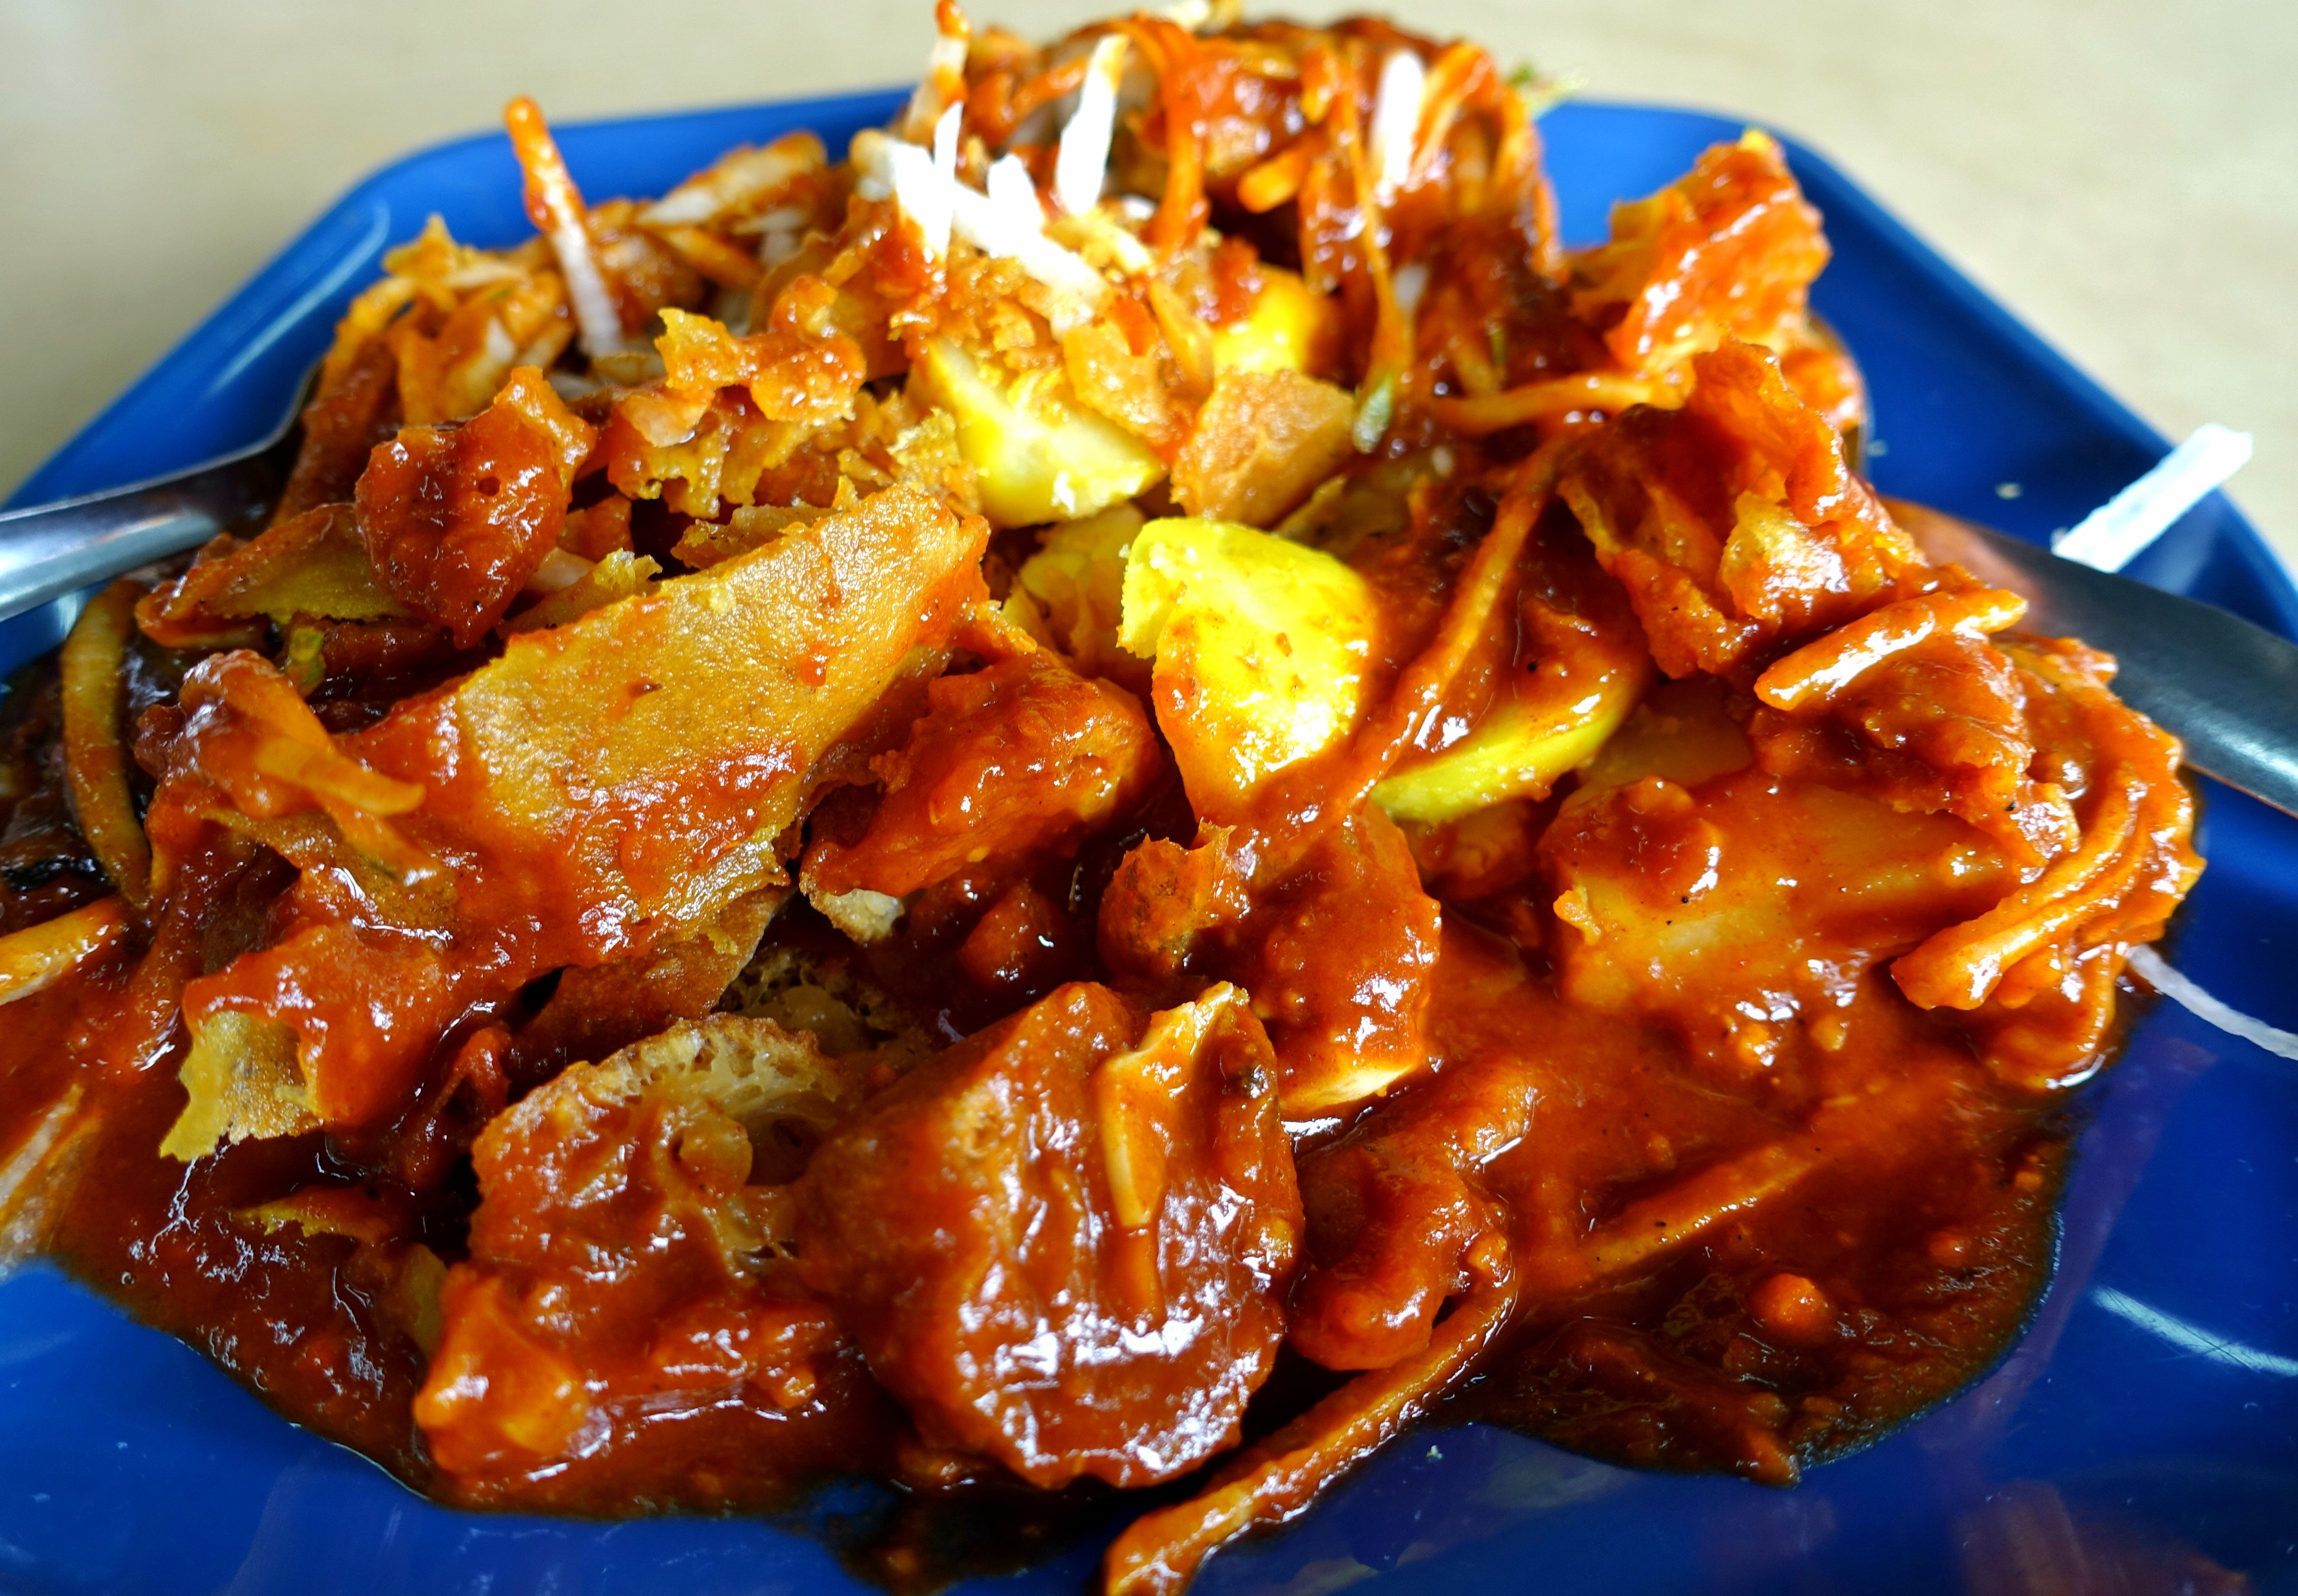 [Penang] Edgecumbe Road Mee Goreng & Pasembur - Asia Pacific - Hungry Onion